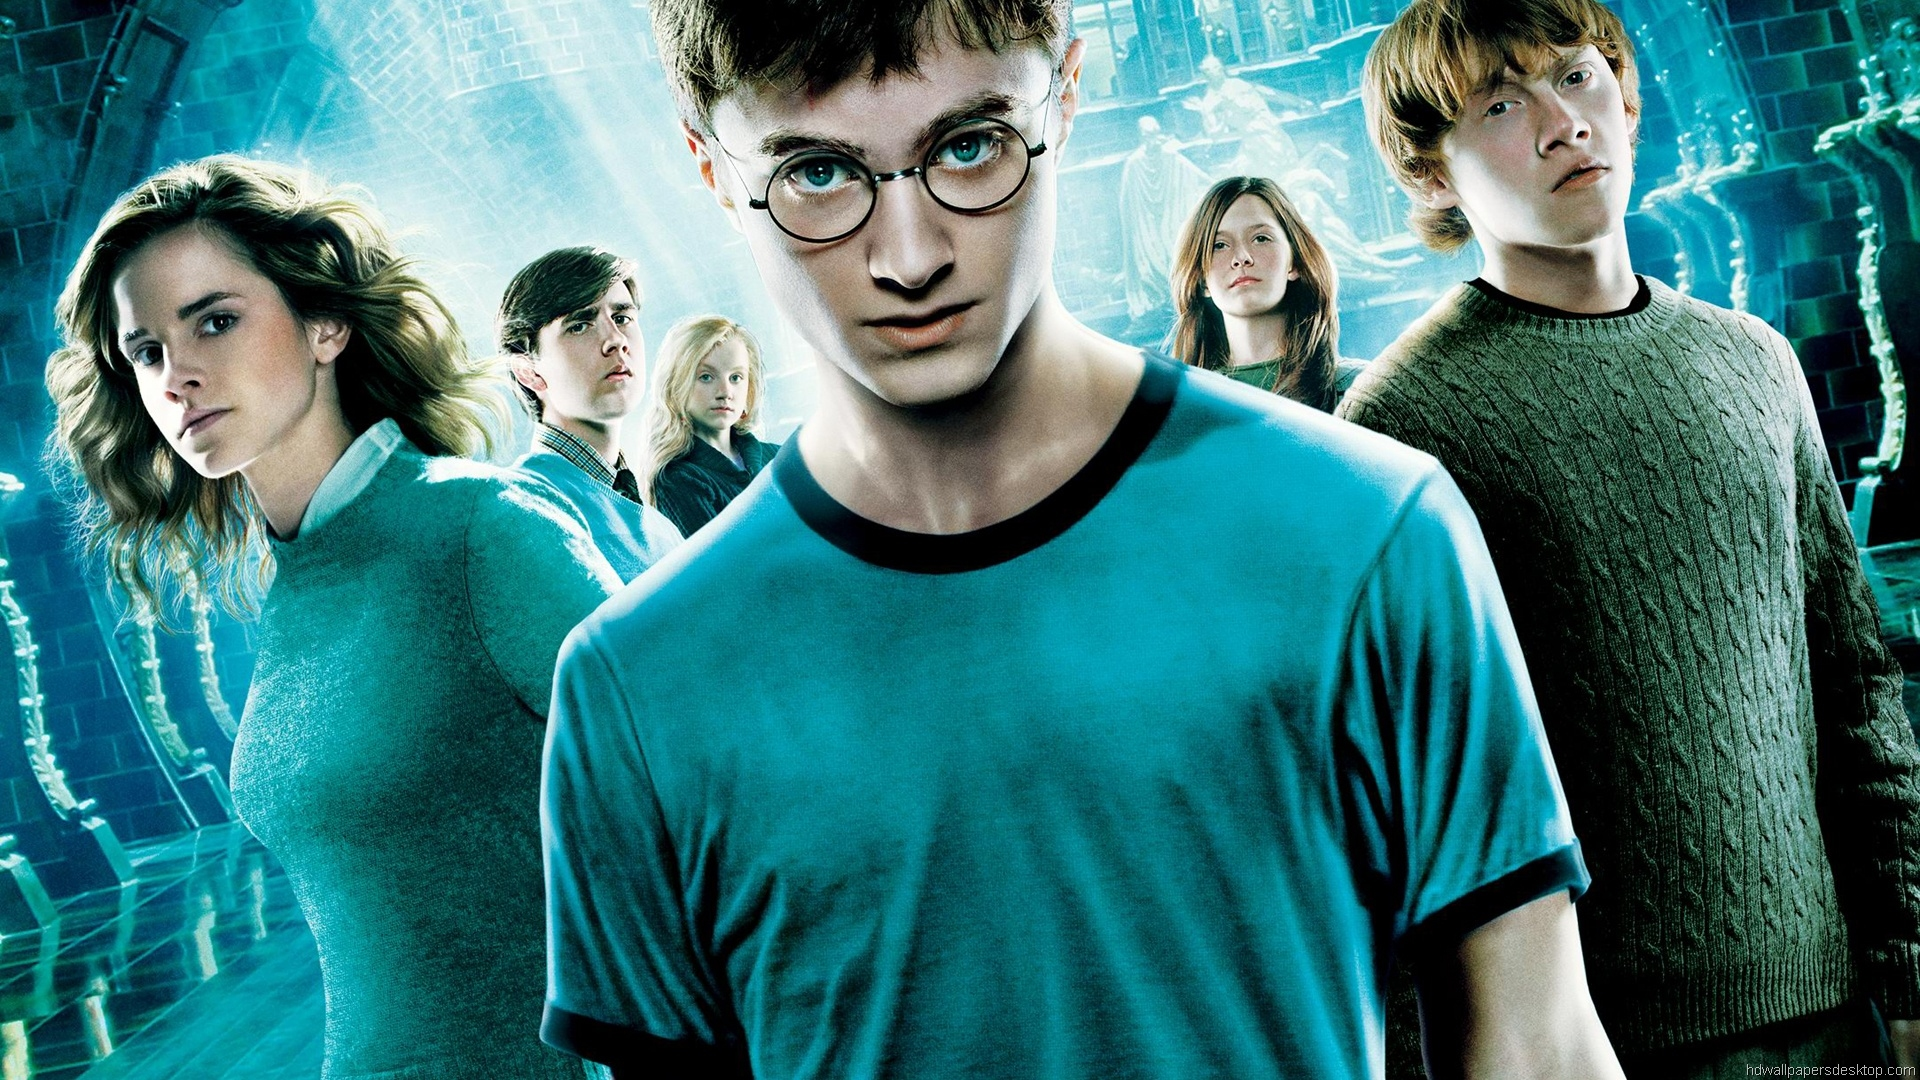 Hd Free Harry Potter Wallpaper Free Download Hd Wallpaper